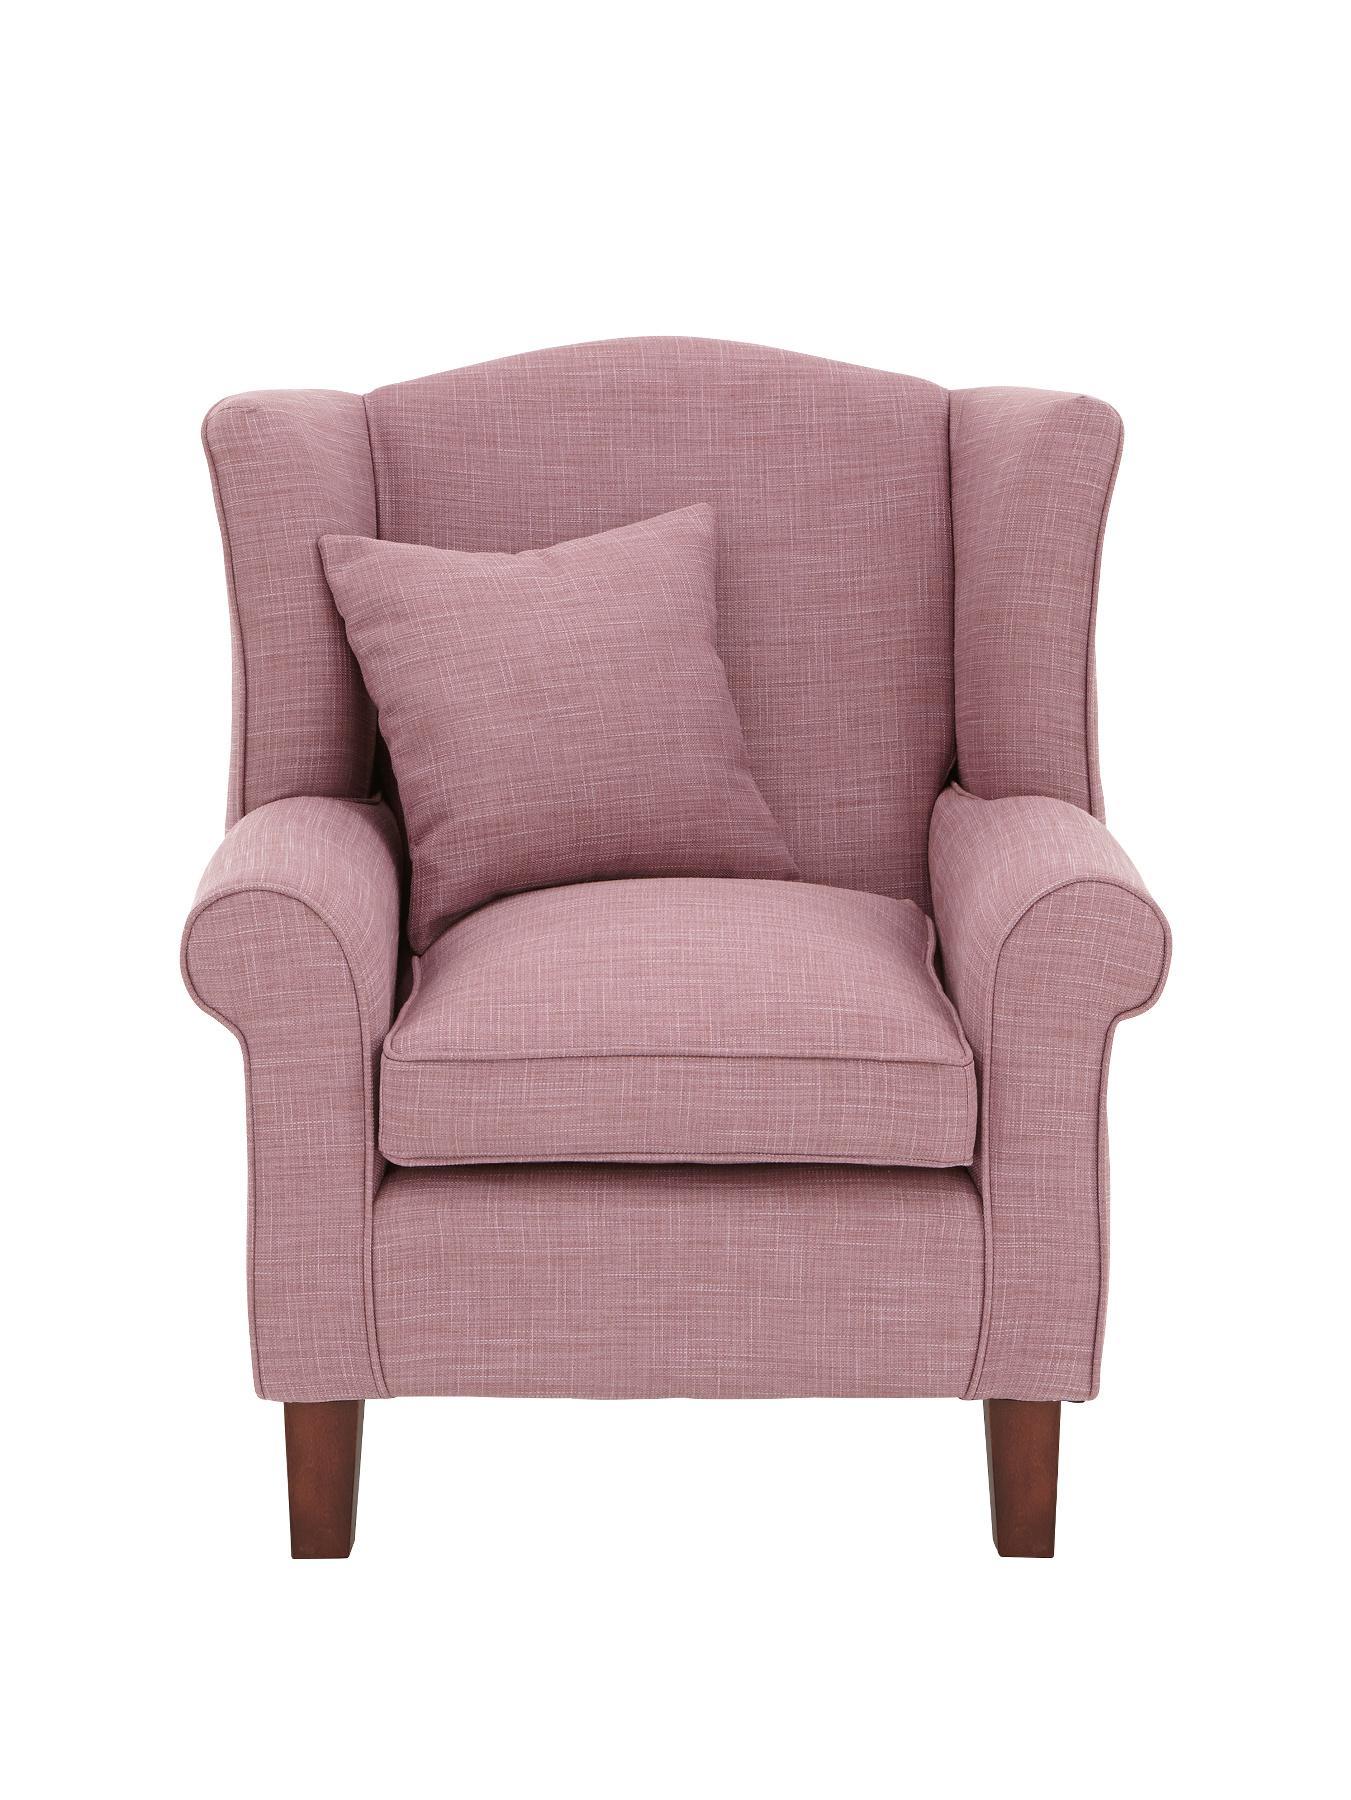 Denton Wing Chair (Heather)